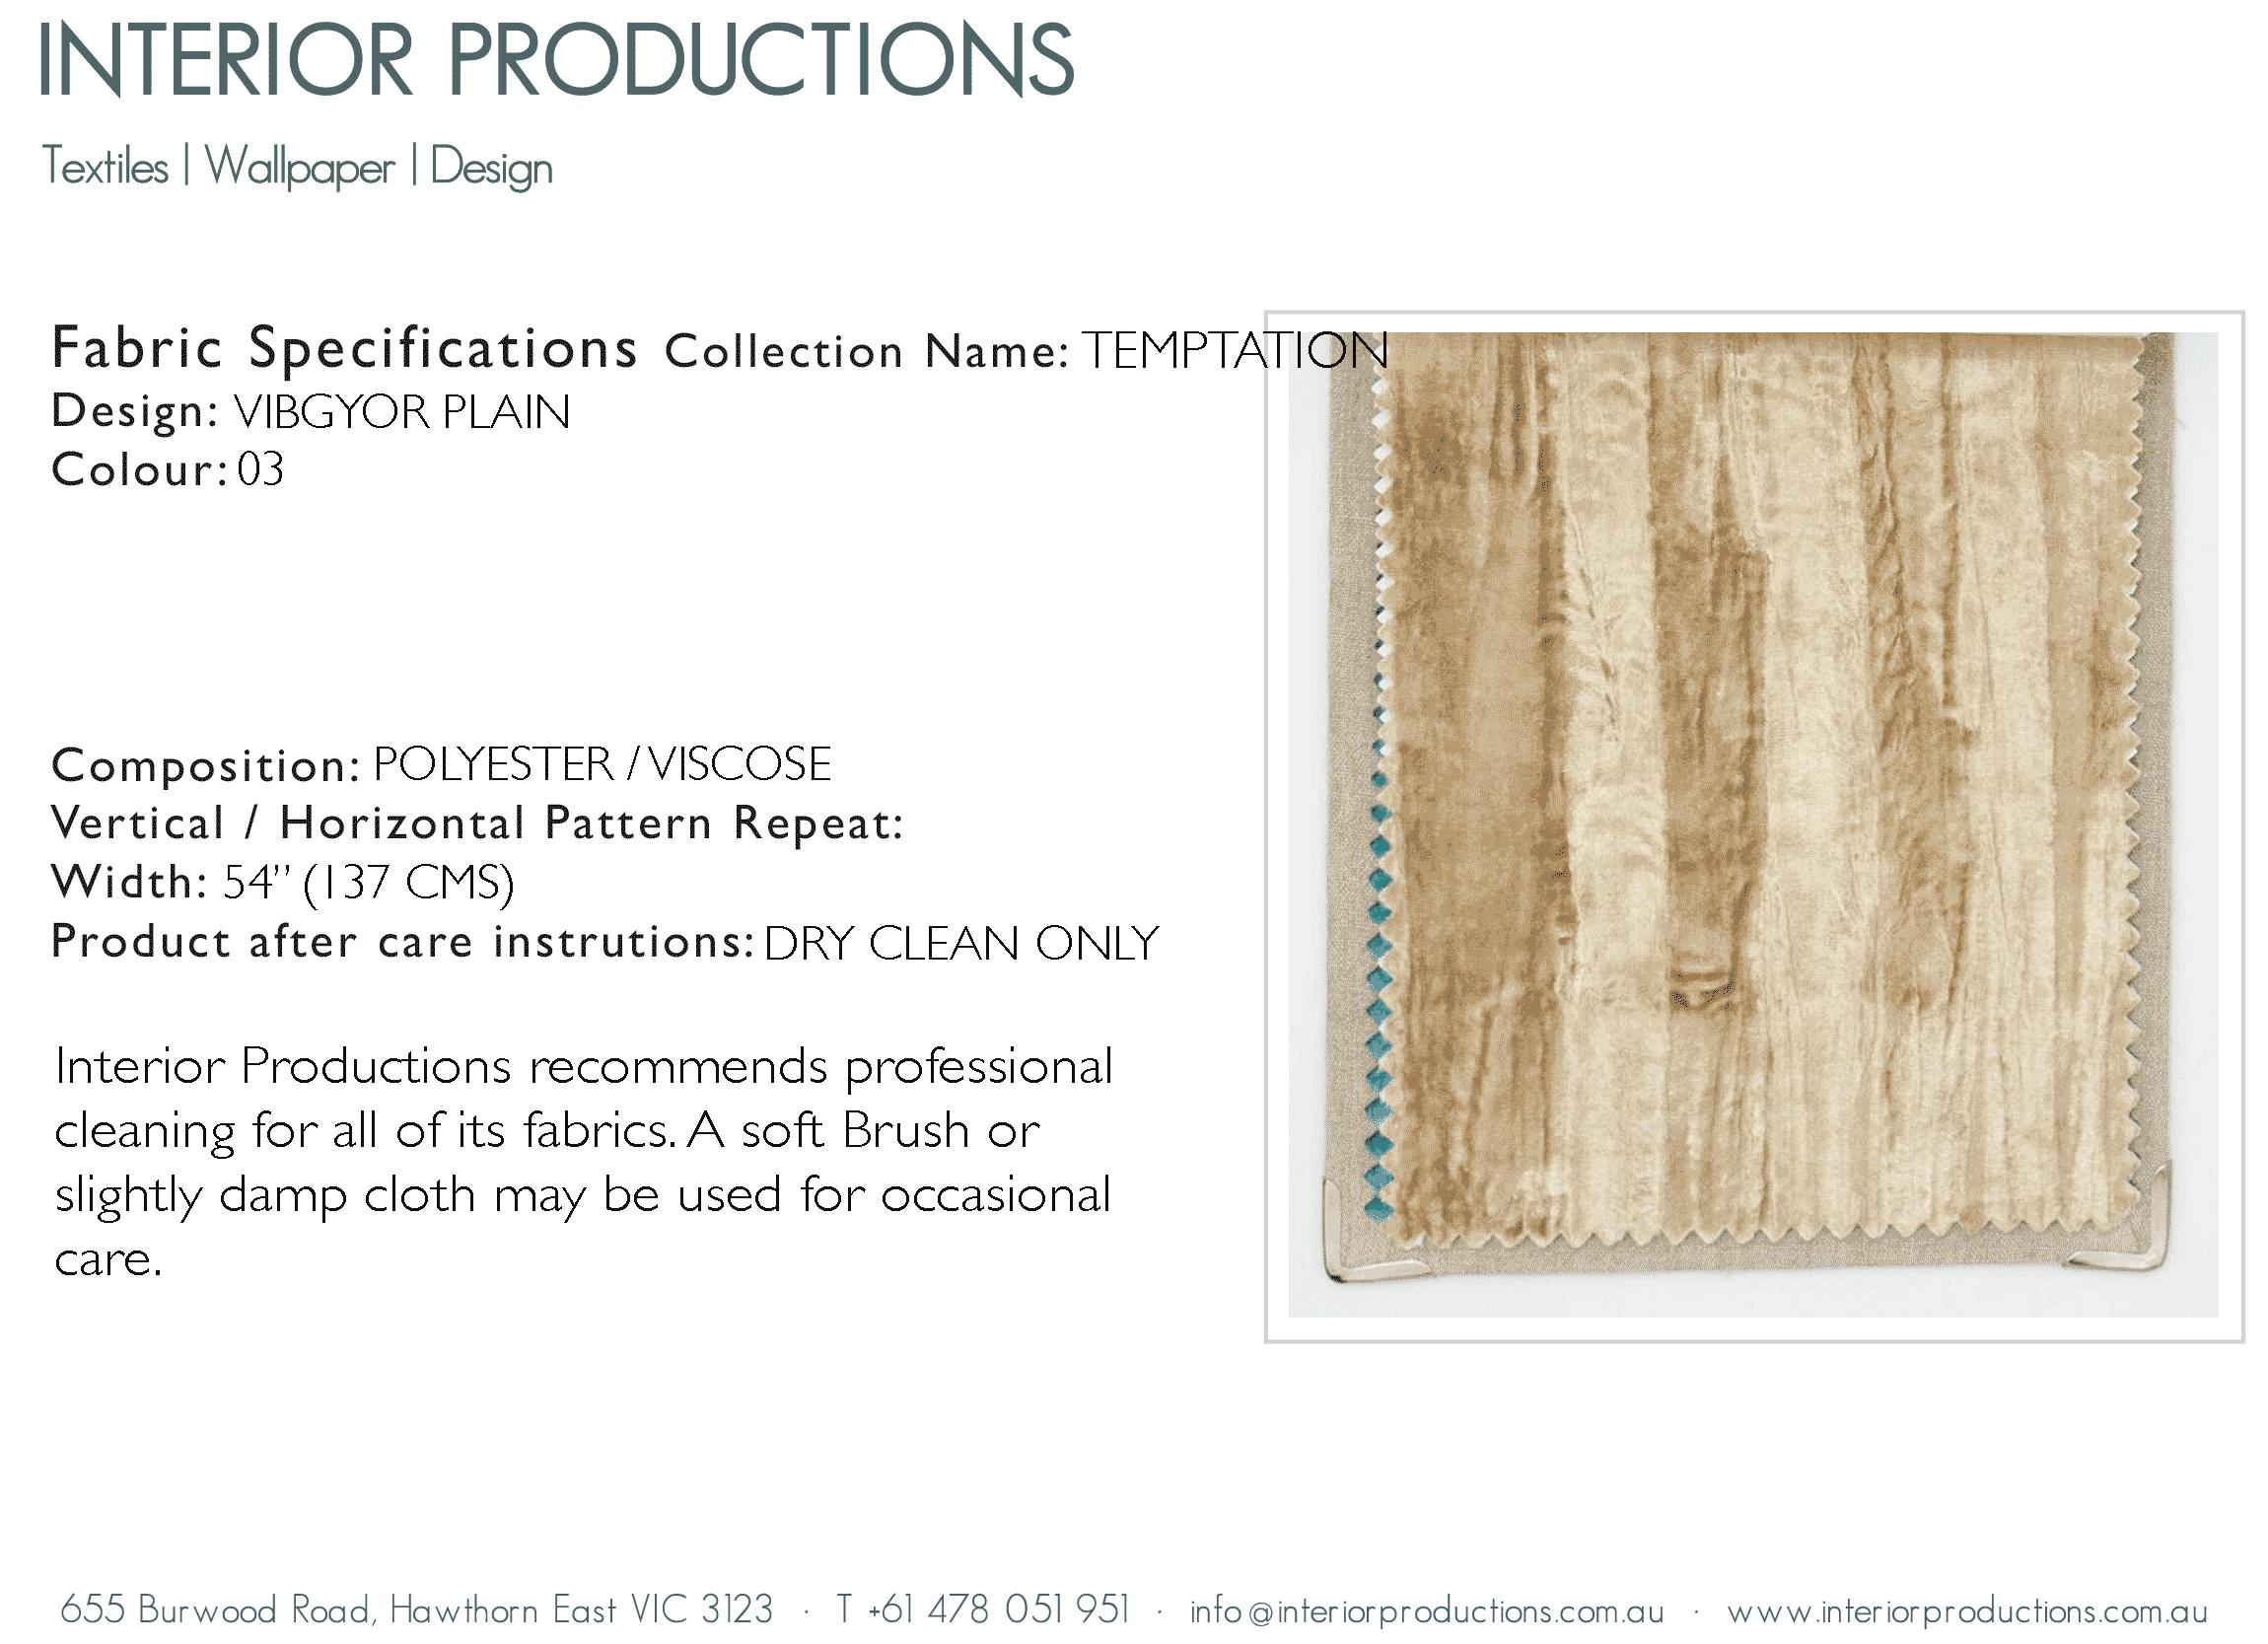 interior_productions_VIBGYOR-PLAIN---03